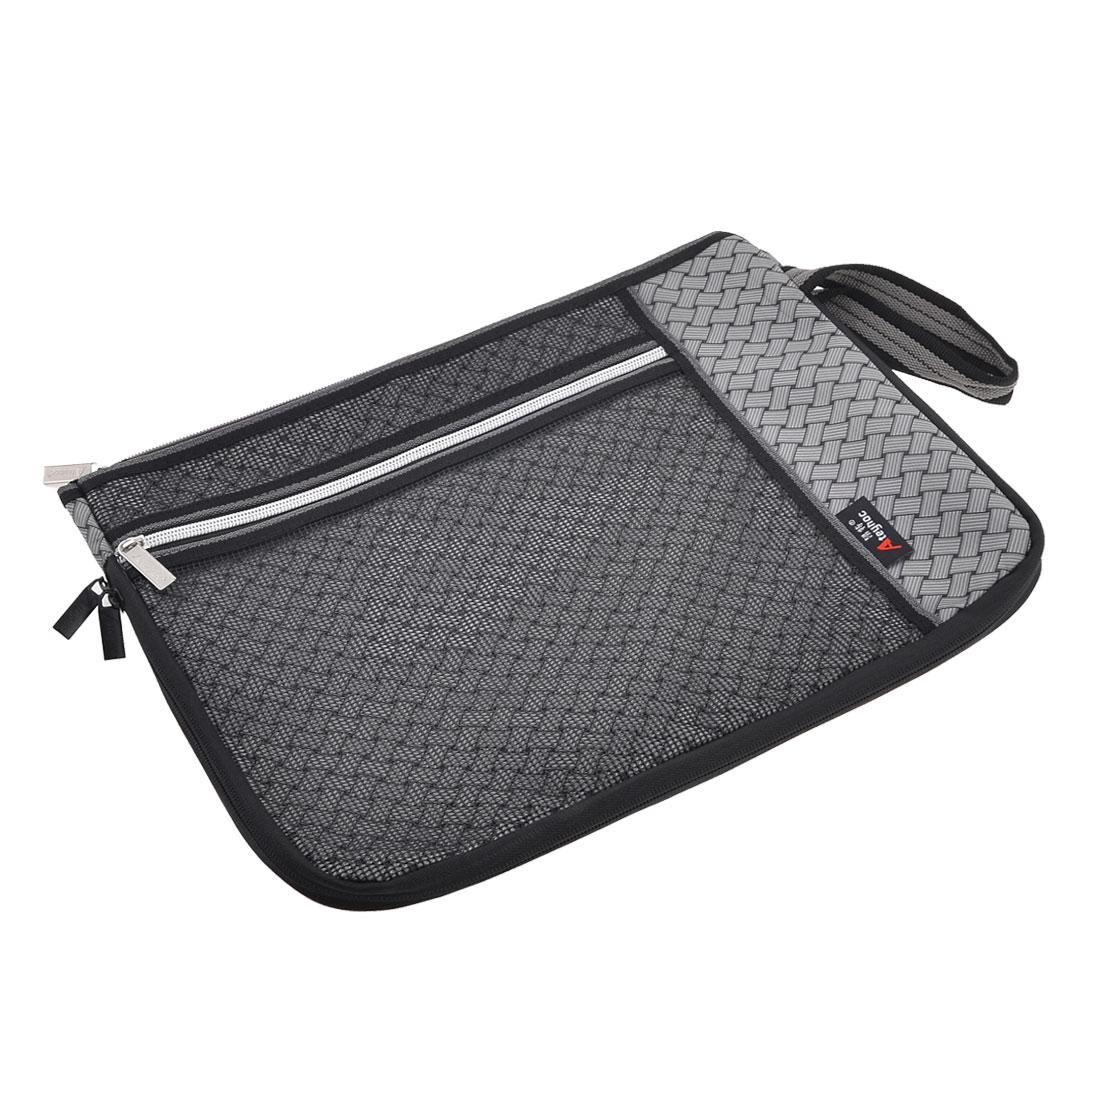 37cm x 27cm Zipper Closure Braid Pattern Two Pockets File Bag Grey